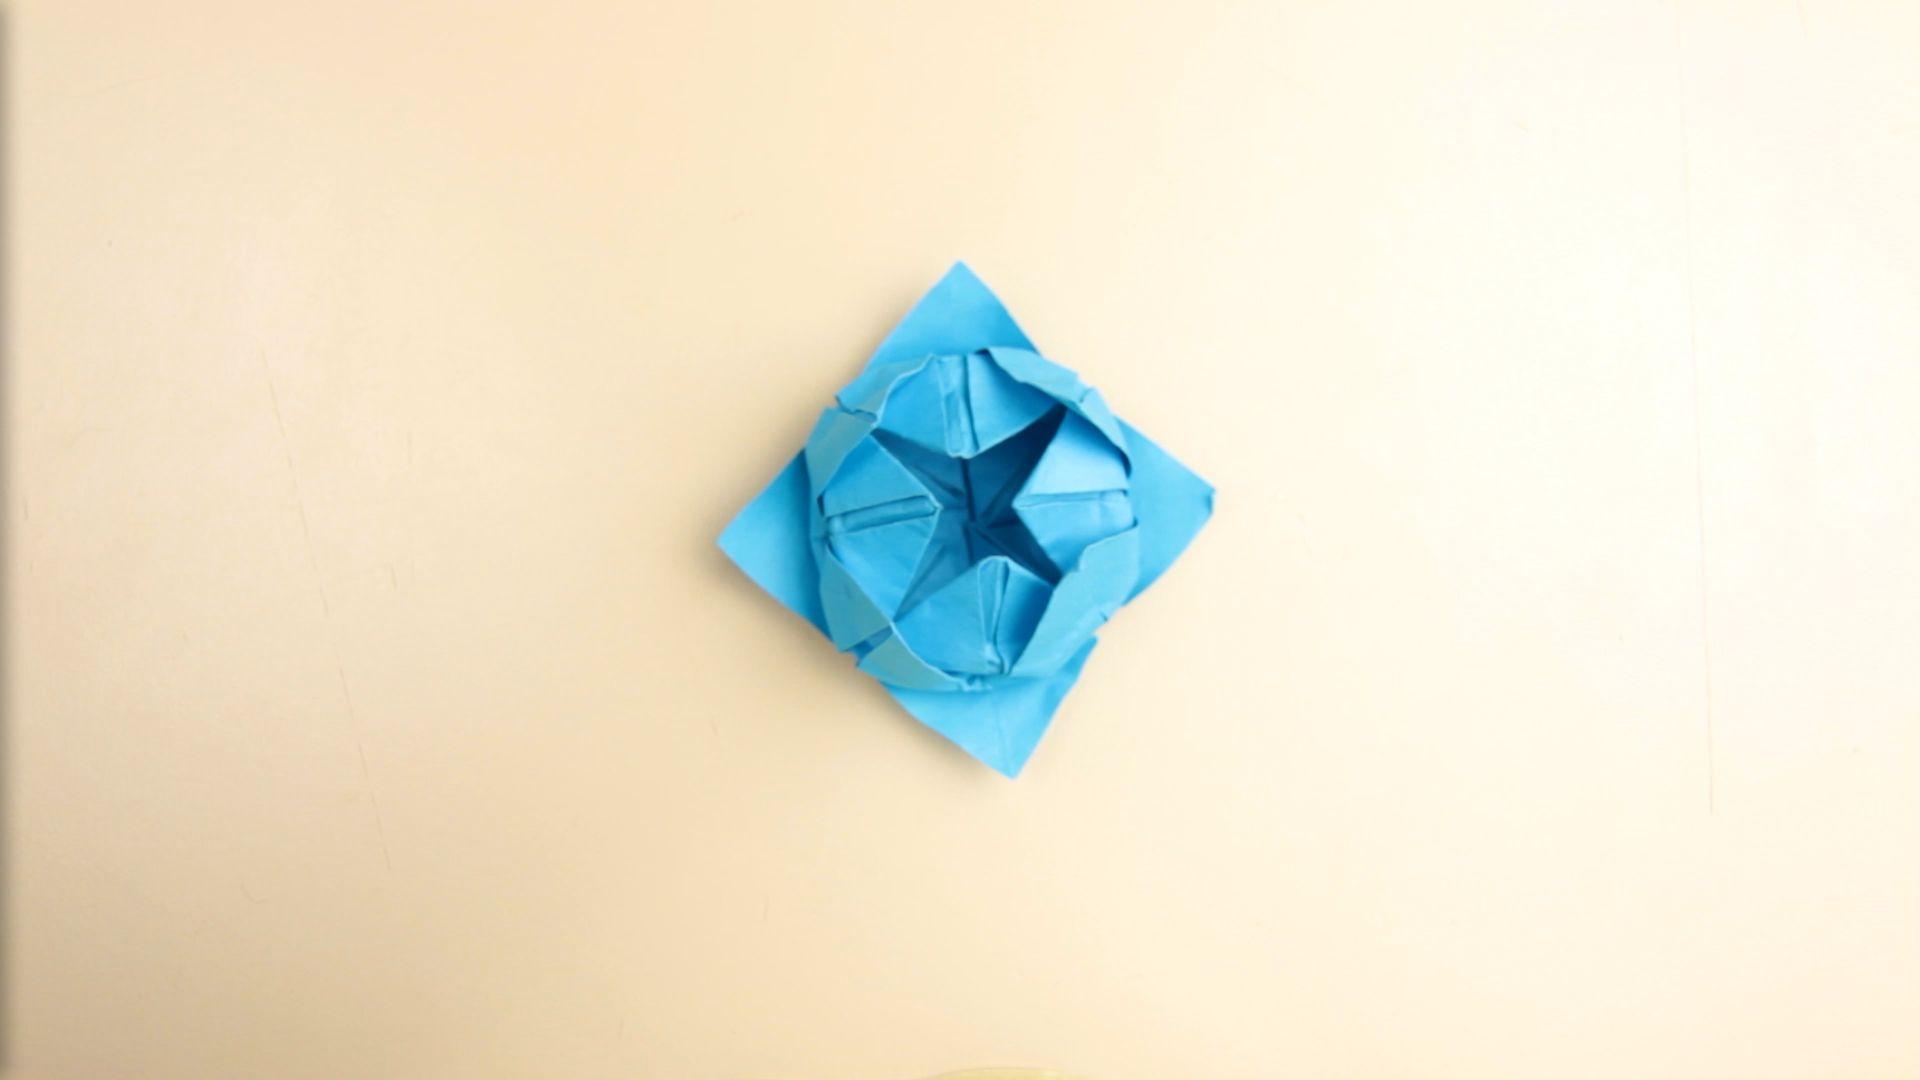 Origami hd desktop